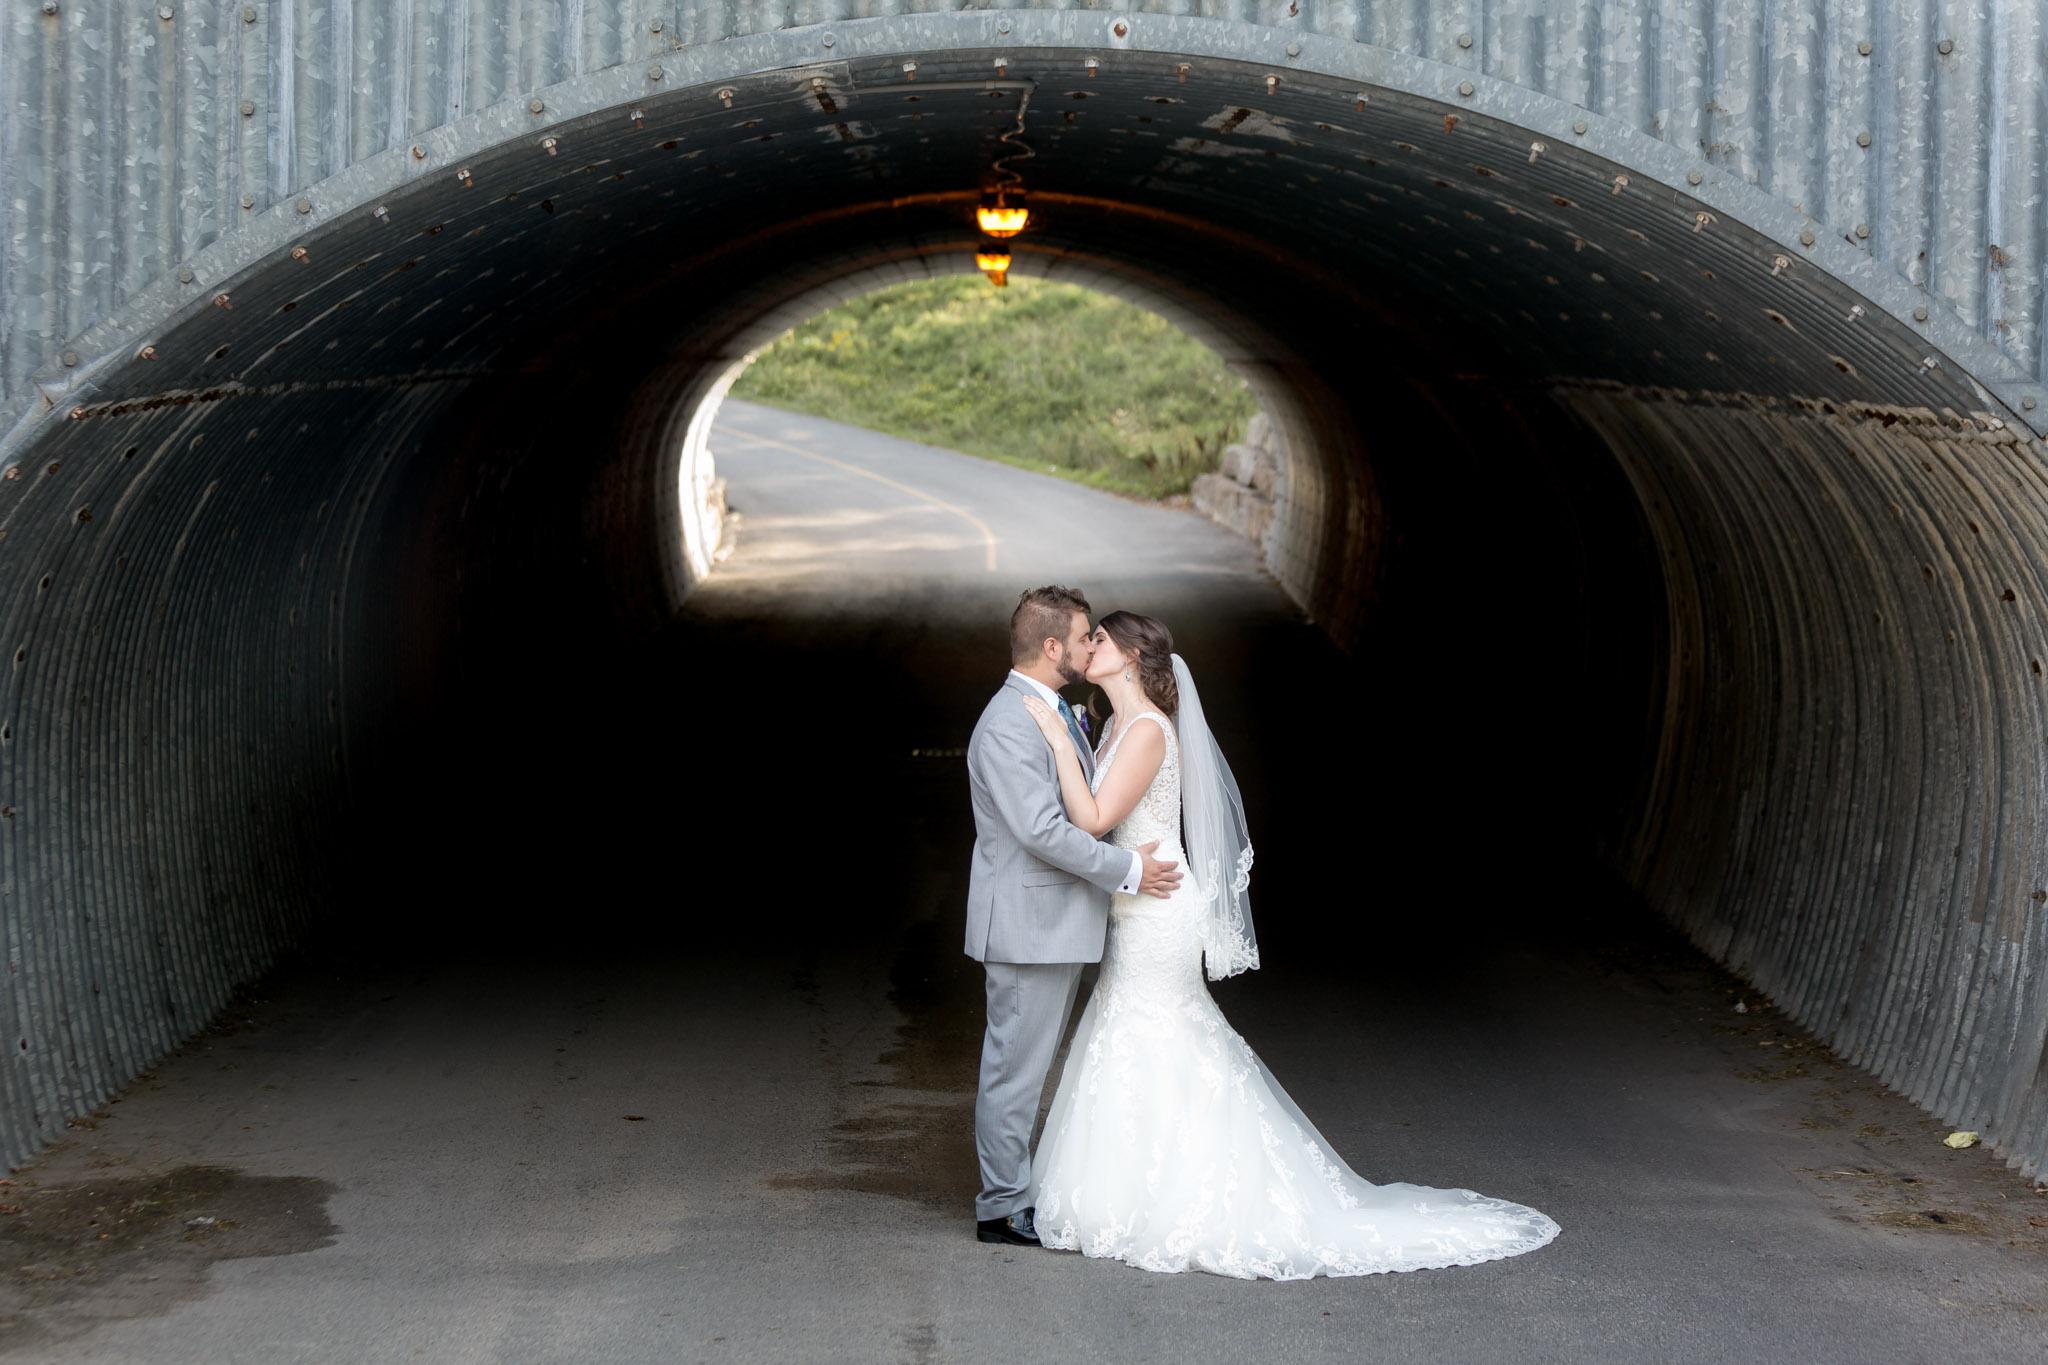 Brookstreet Hotel weddings #ottawa #wedding  #photographer-3176.jpg